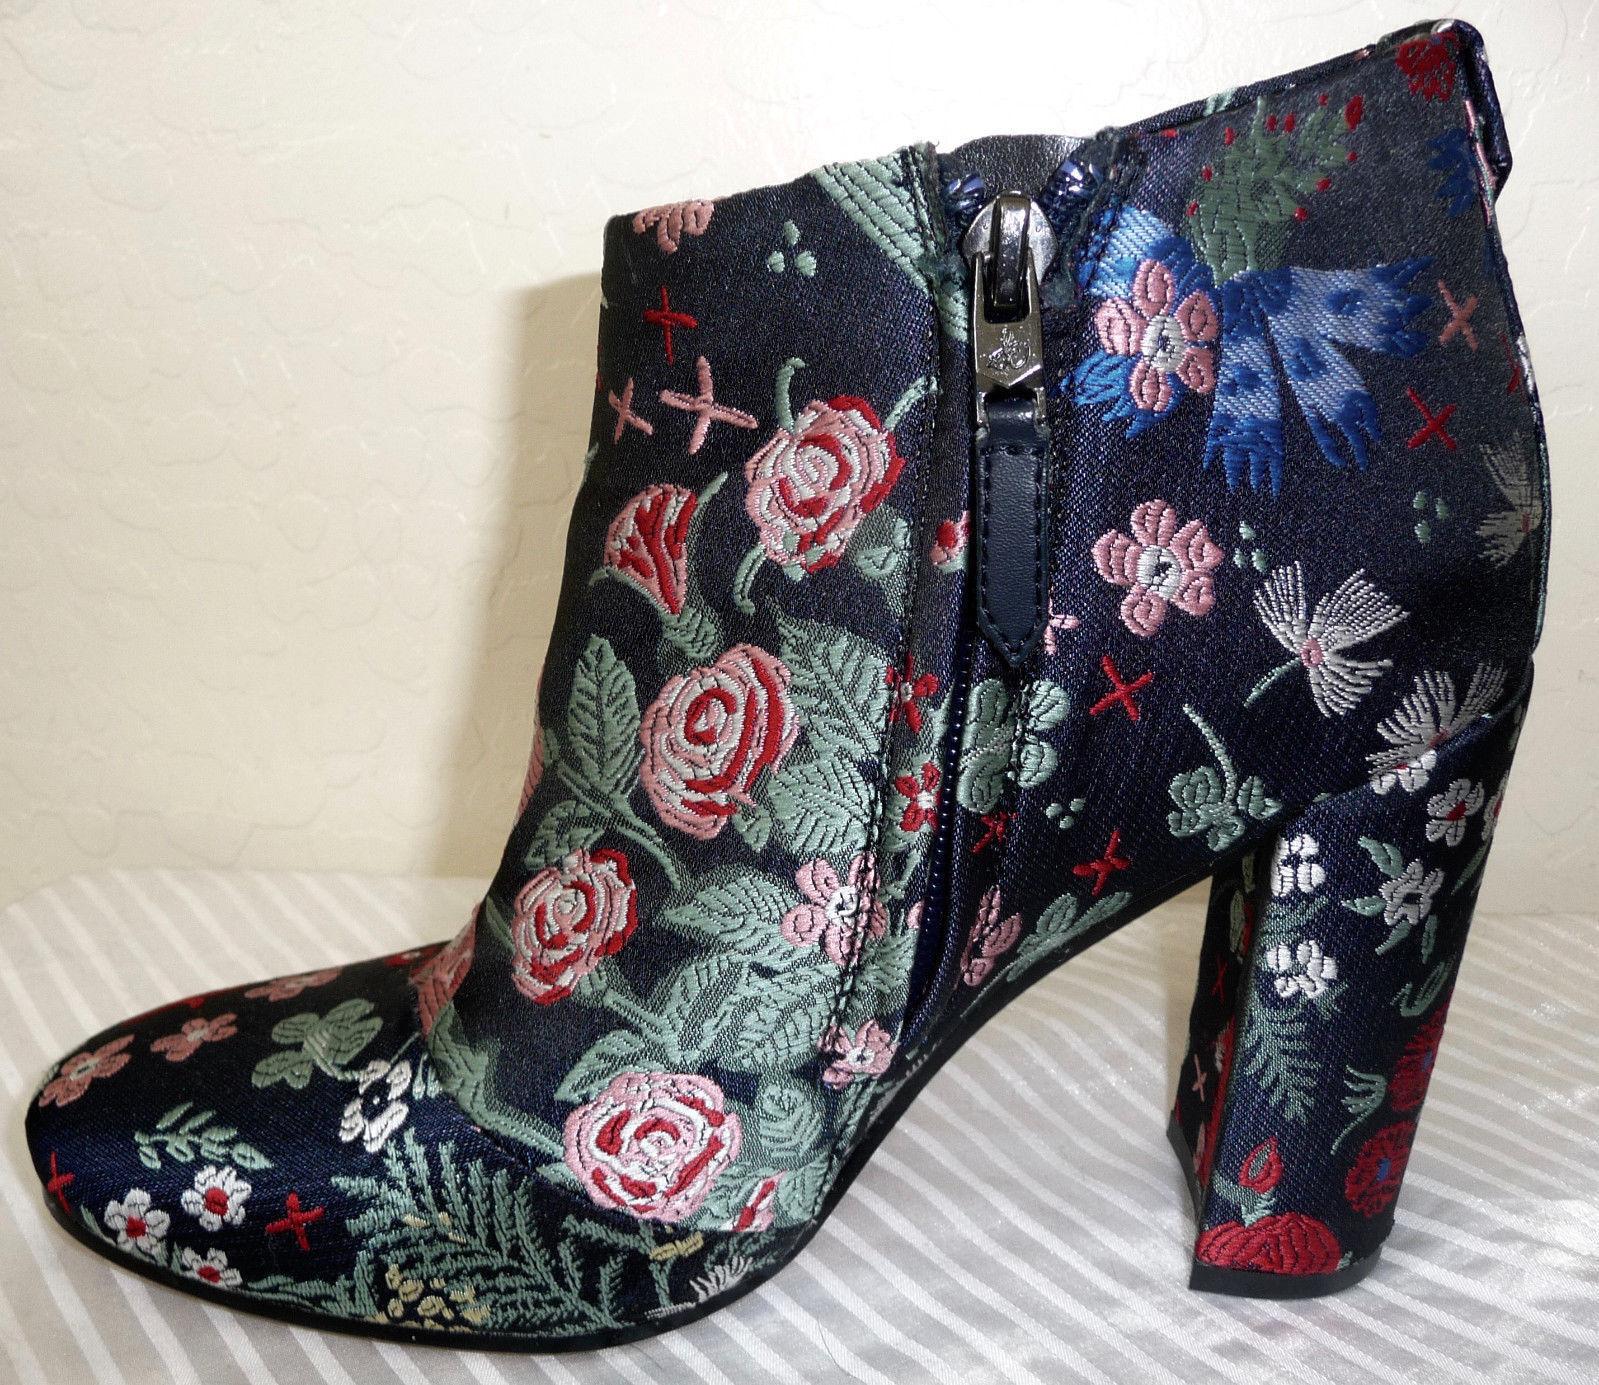 Sam Edleman Cambell Multi Floral Brocade Bootie Size 6.5 Originally 160.00